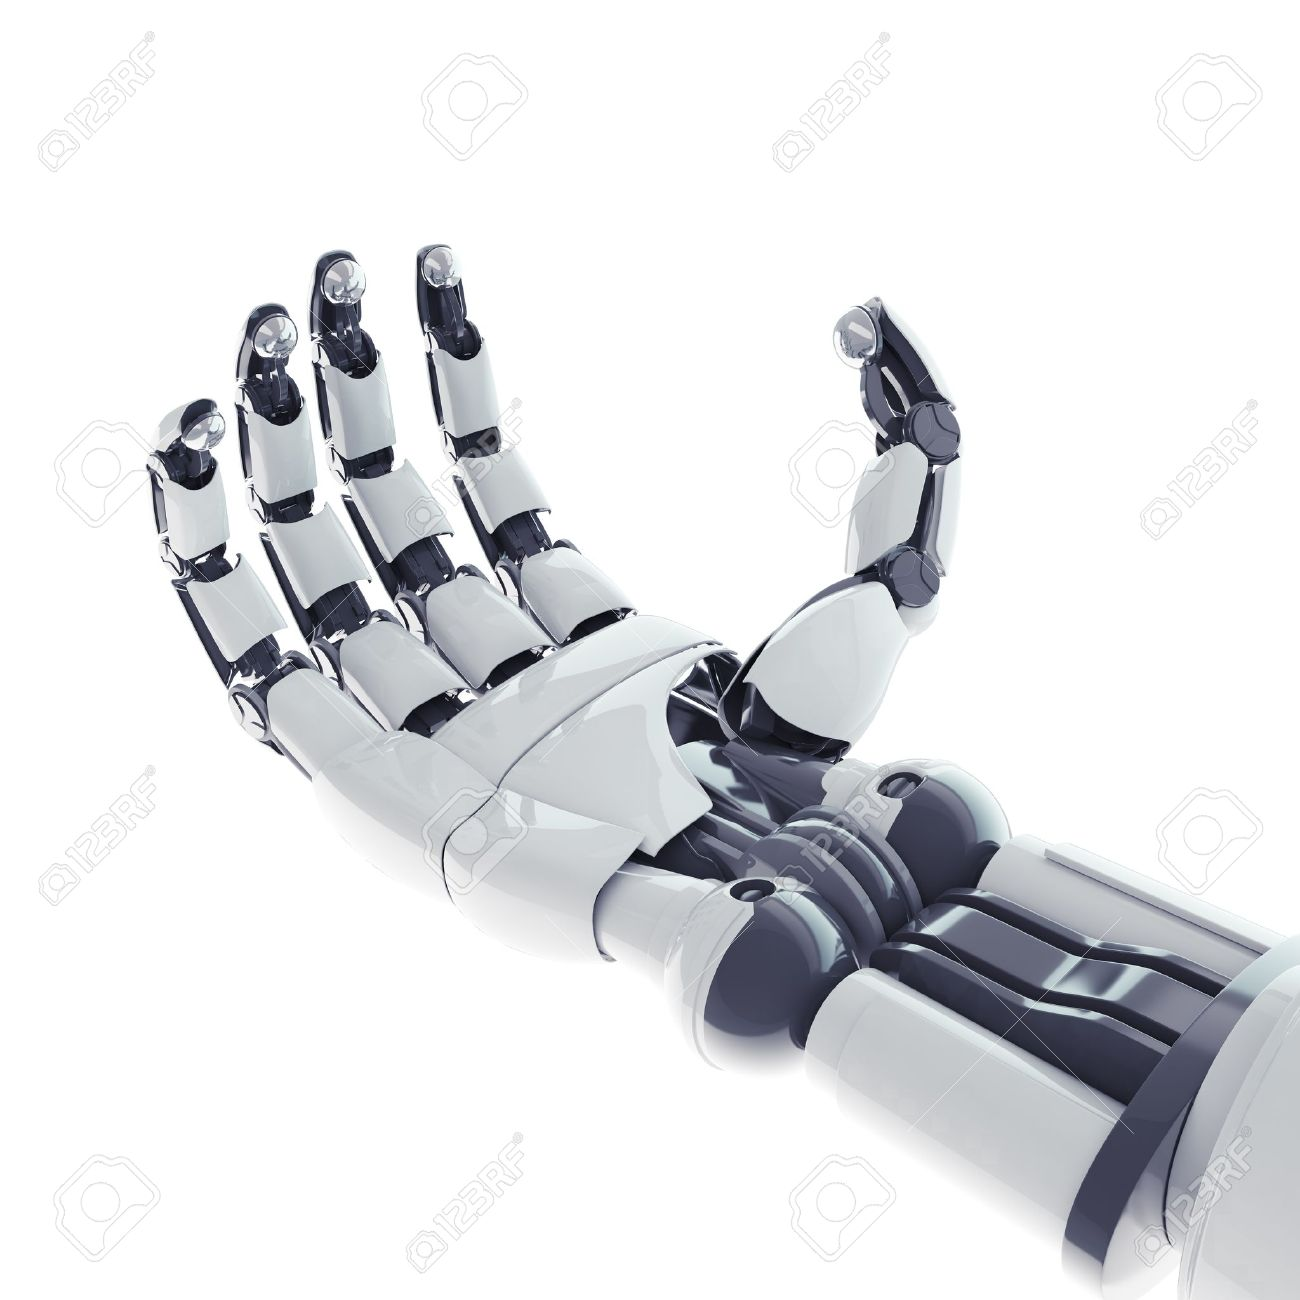 Isolated robotic arm on white background